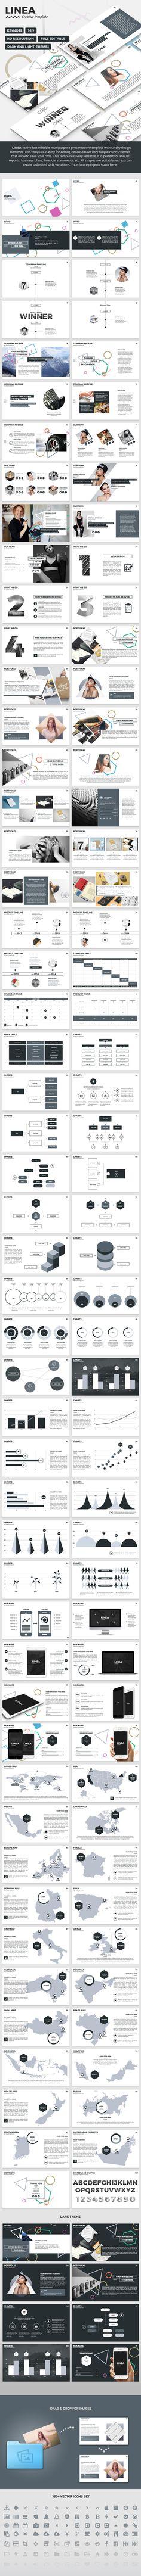 Linea - Creative Keynote Presentation Template. Download here: http://graphicriver.net/item/linea-creative-keynote-presentation-template/15713386?ref=ksioks